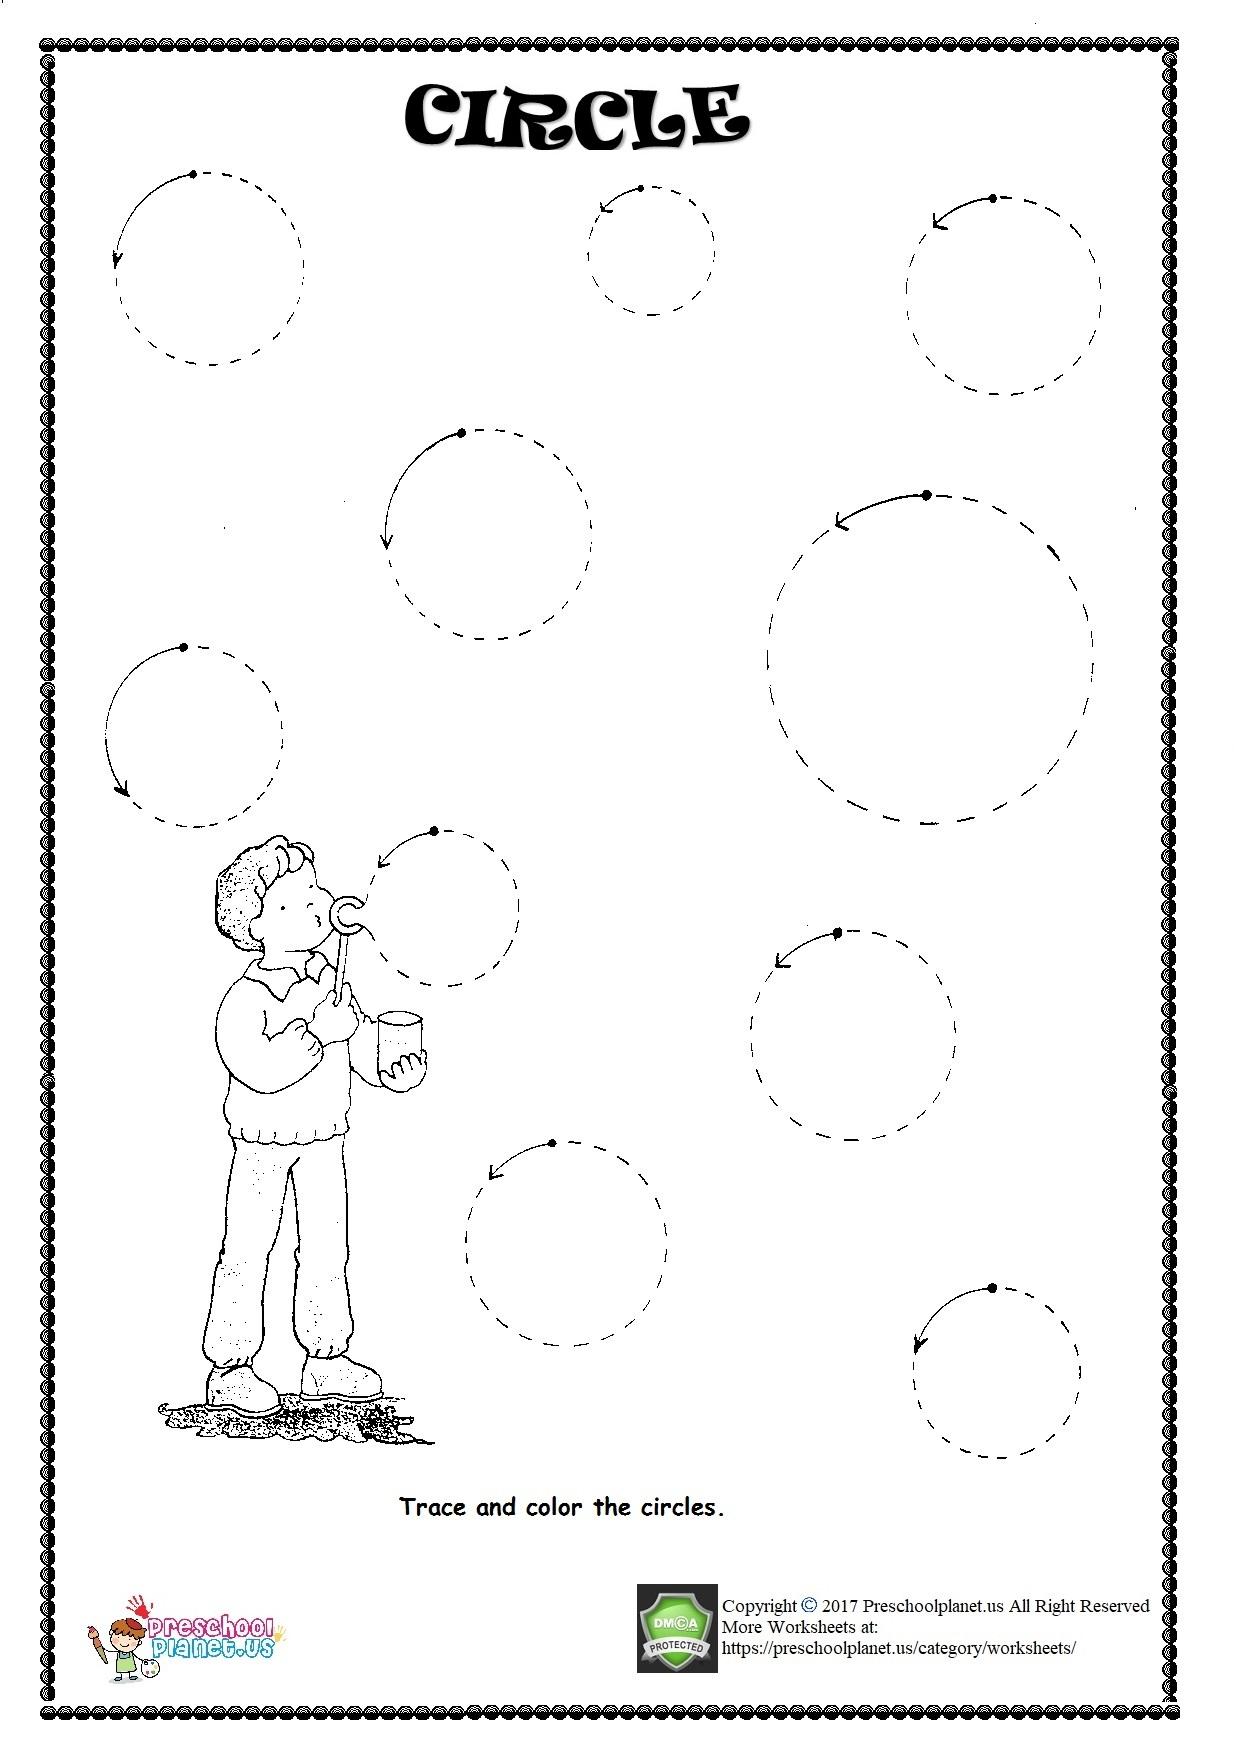 Circle Trace Worksheet – Preschoolplanet